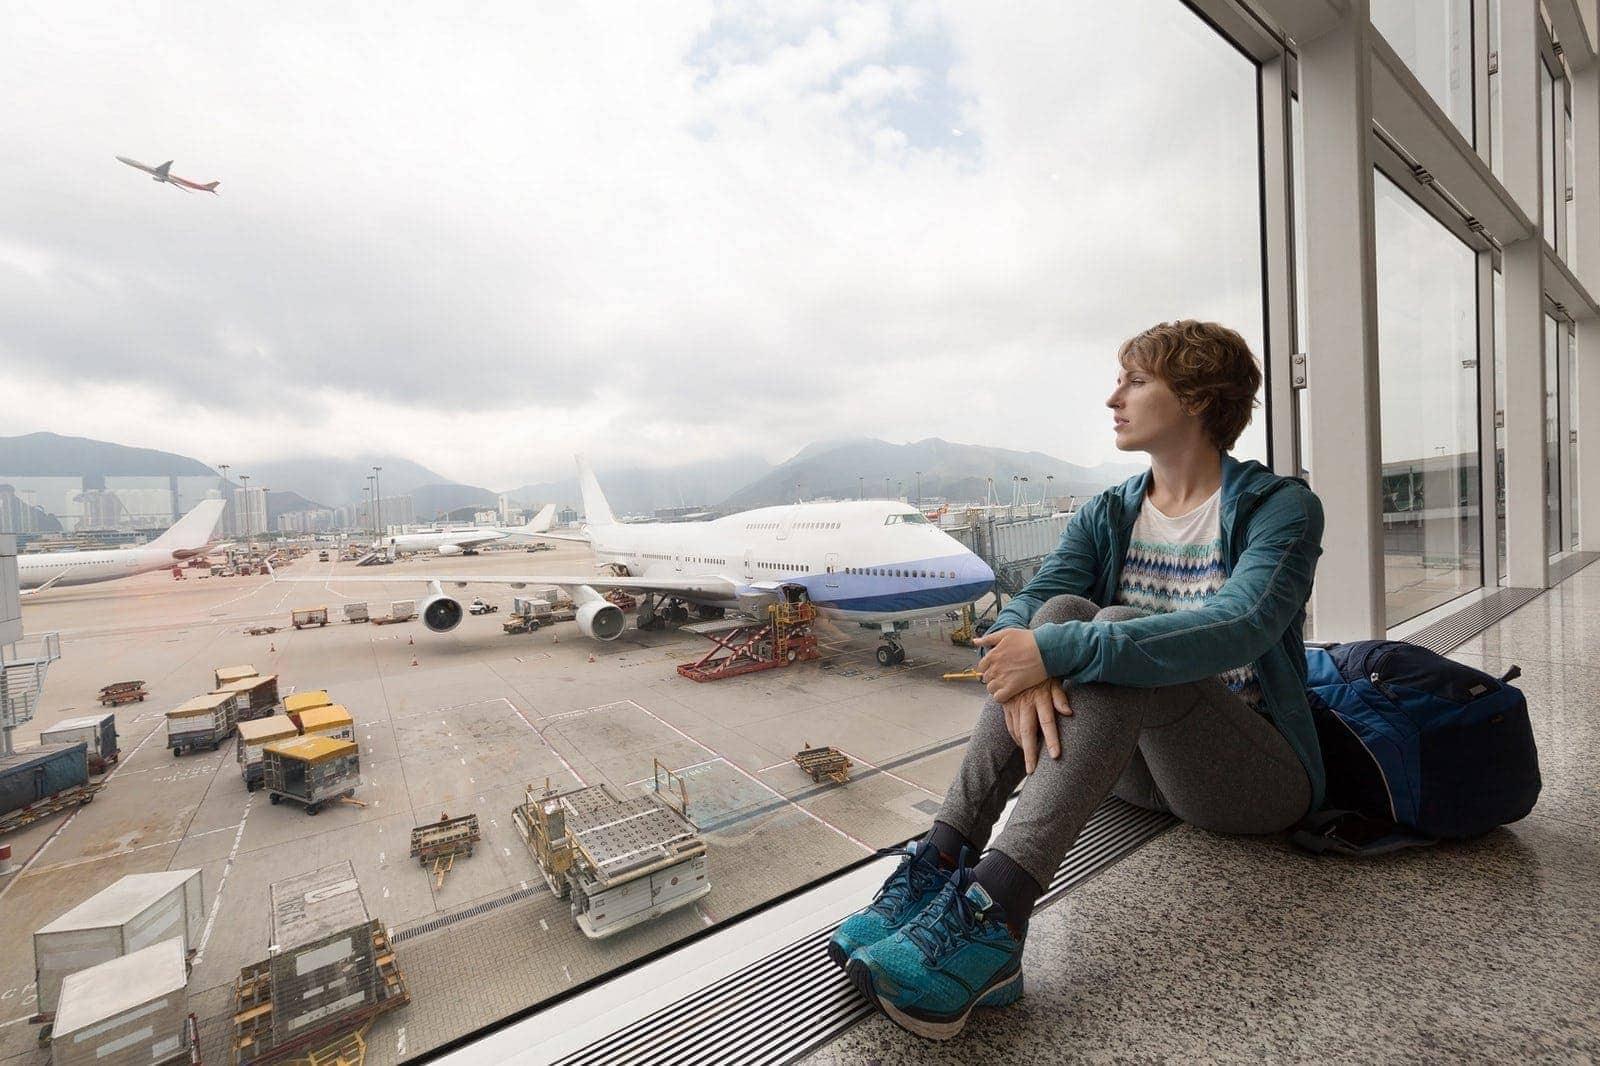 Airport passenger flight